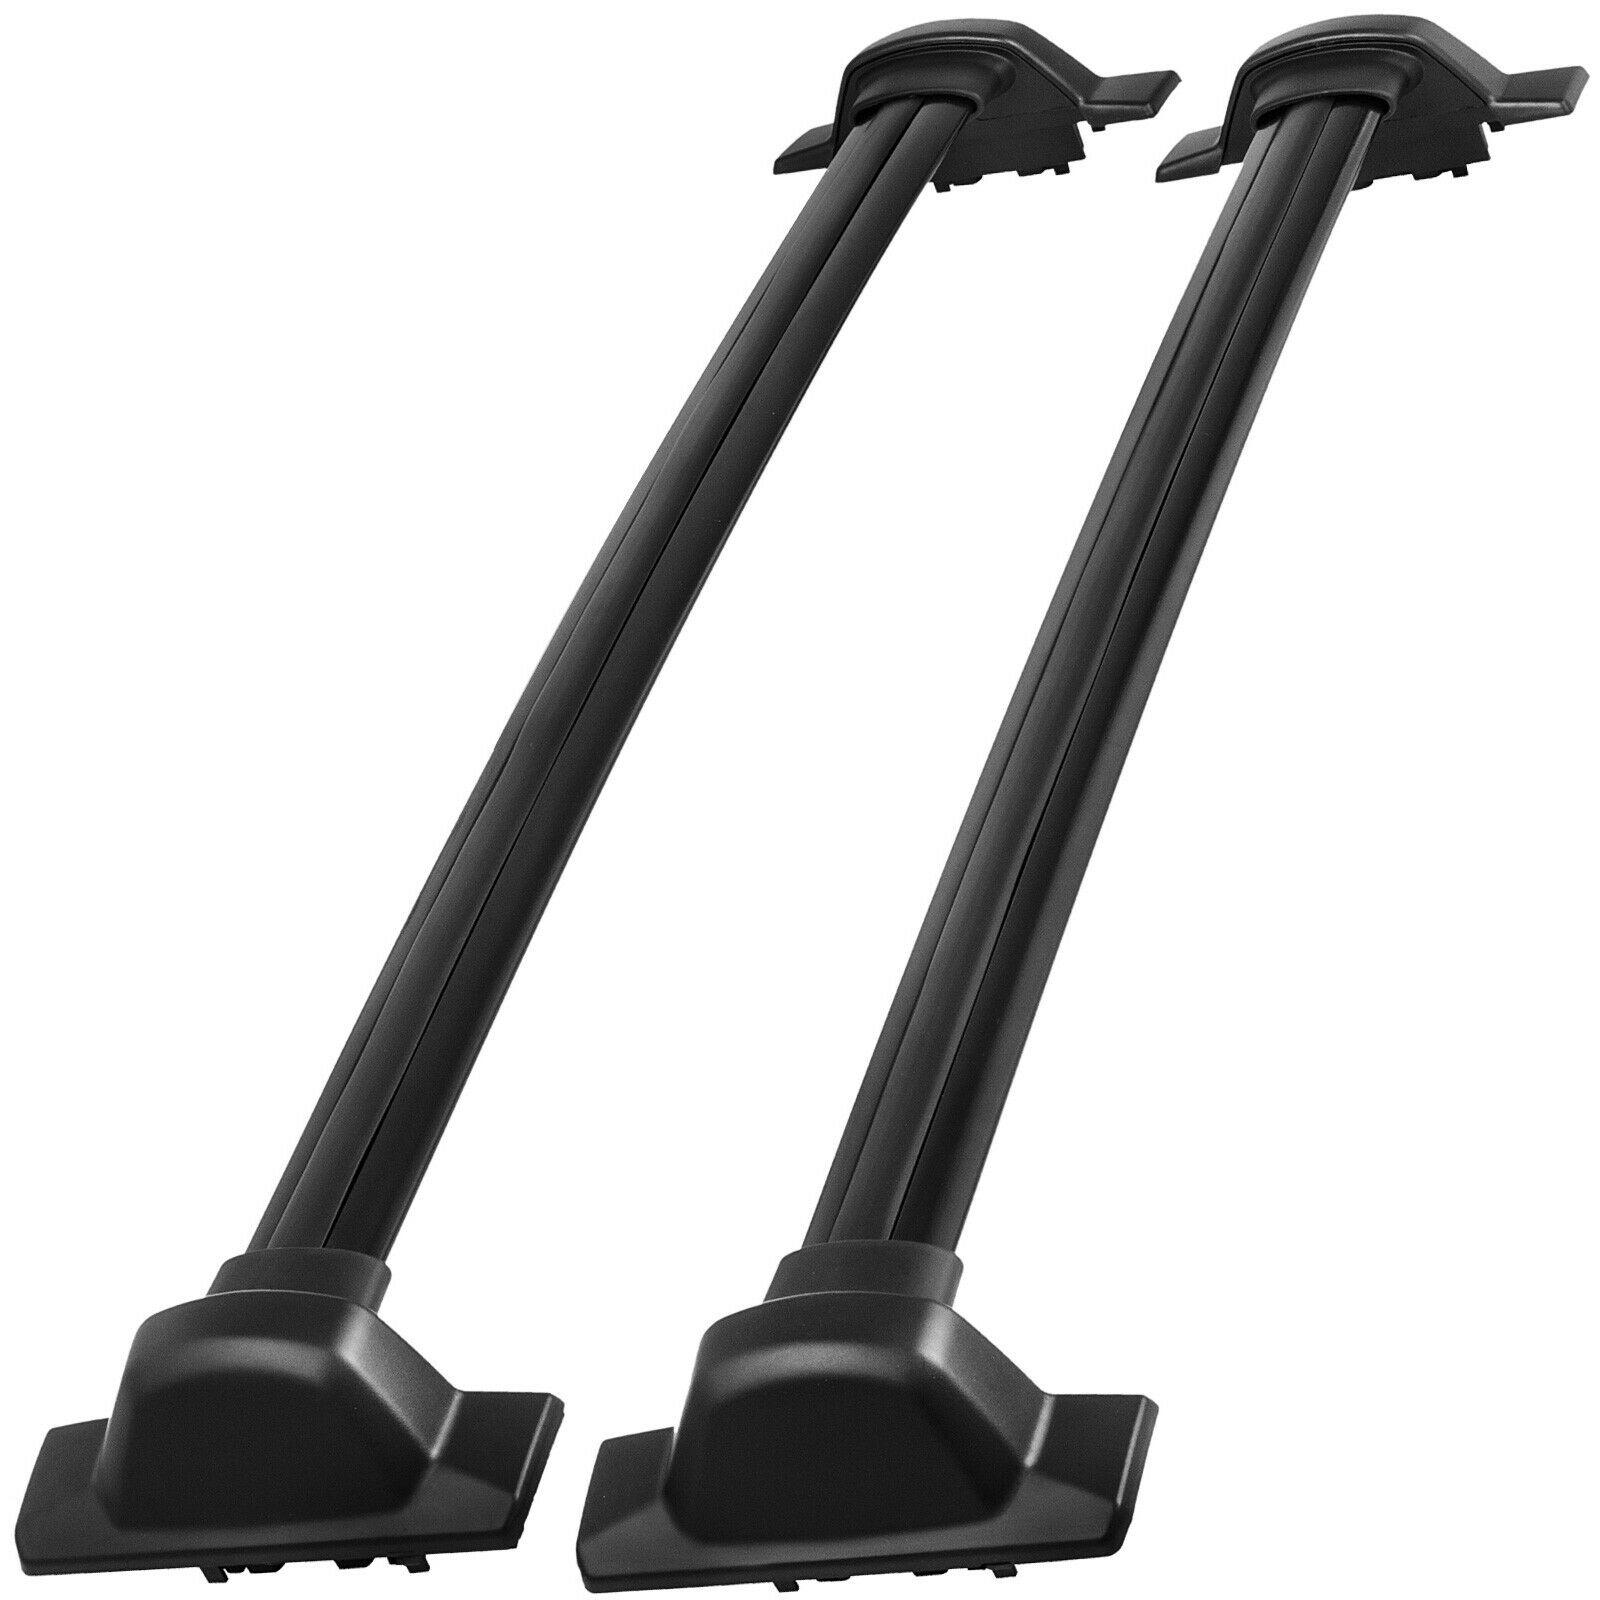 2 Pcs Roof Rack Cross Bar Fits Honda CRV CR-V 2007-2012 Black Aluminum OE Style